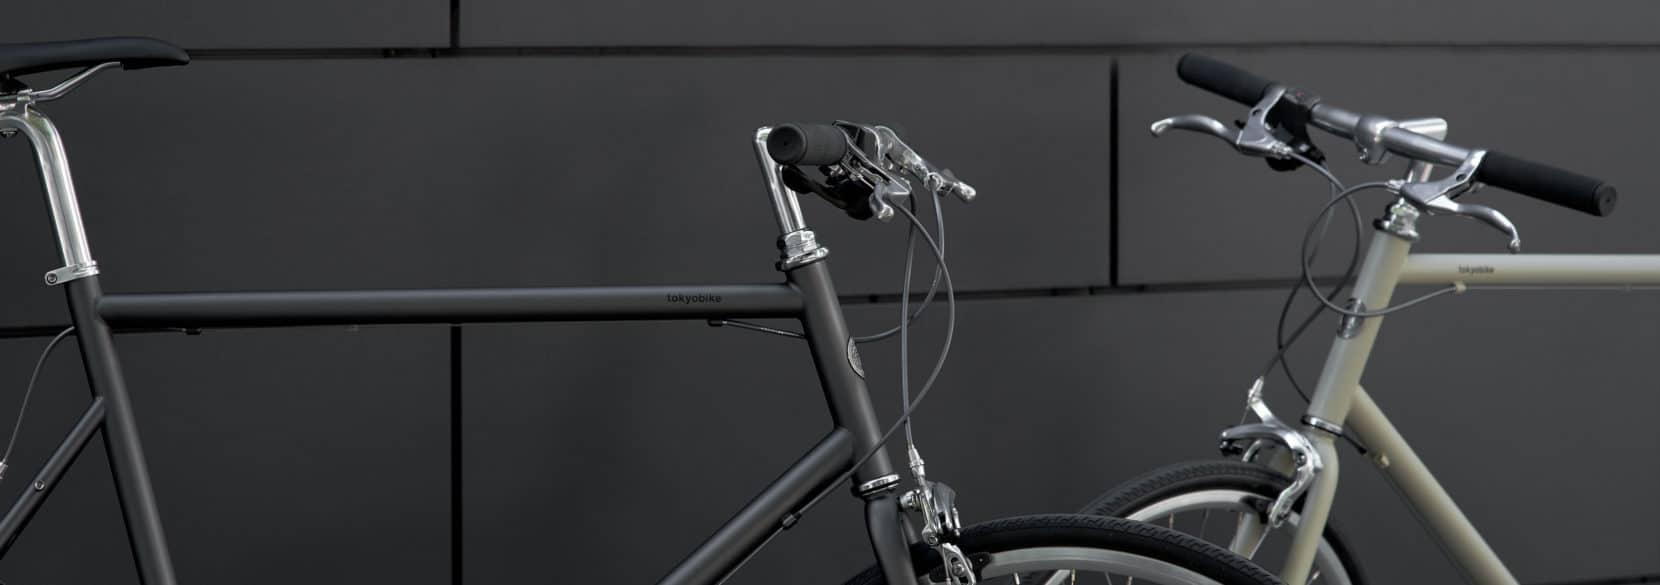 TOKYOBIKE CS 2021年 トーキョーバイク 新モデル